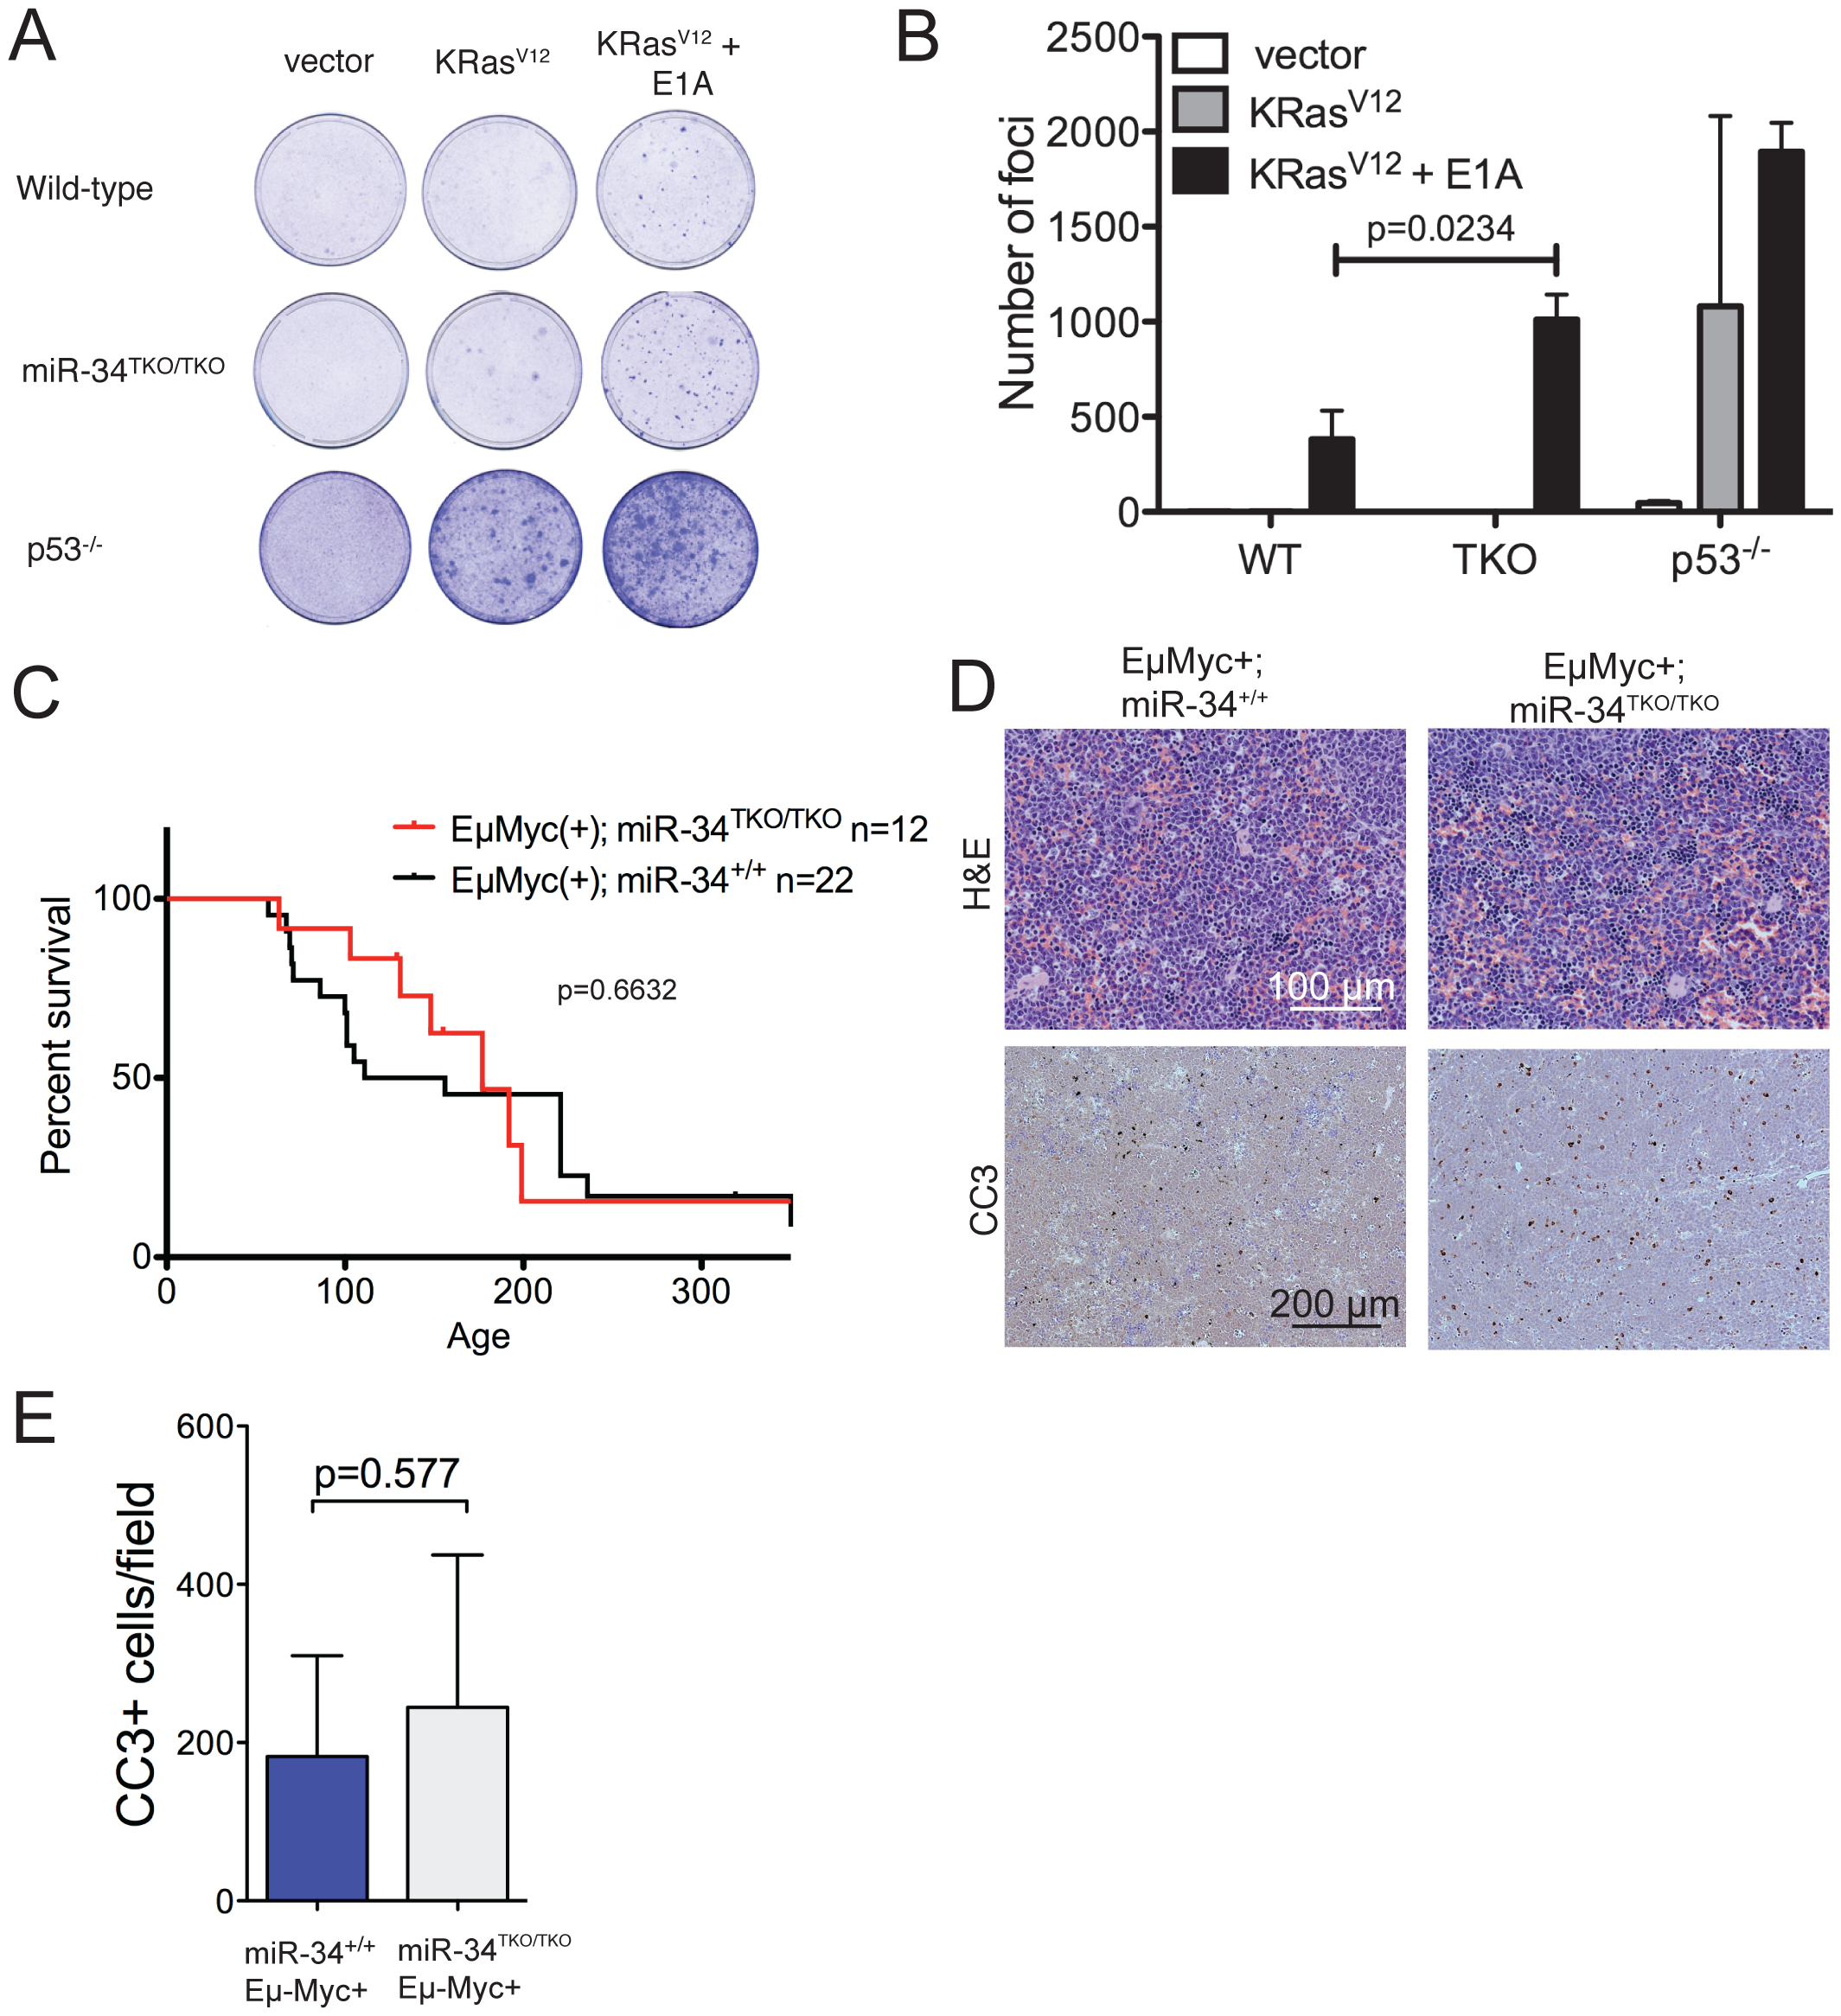 Oncogene-induced transformation in miR-34<sup>TKO/TKO</sup> fibroblasts and mice.